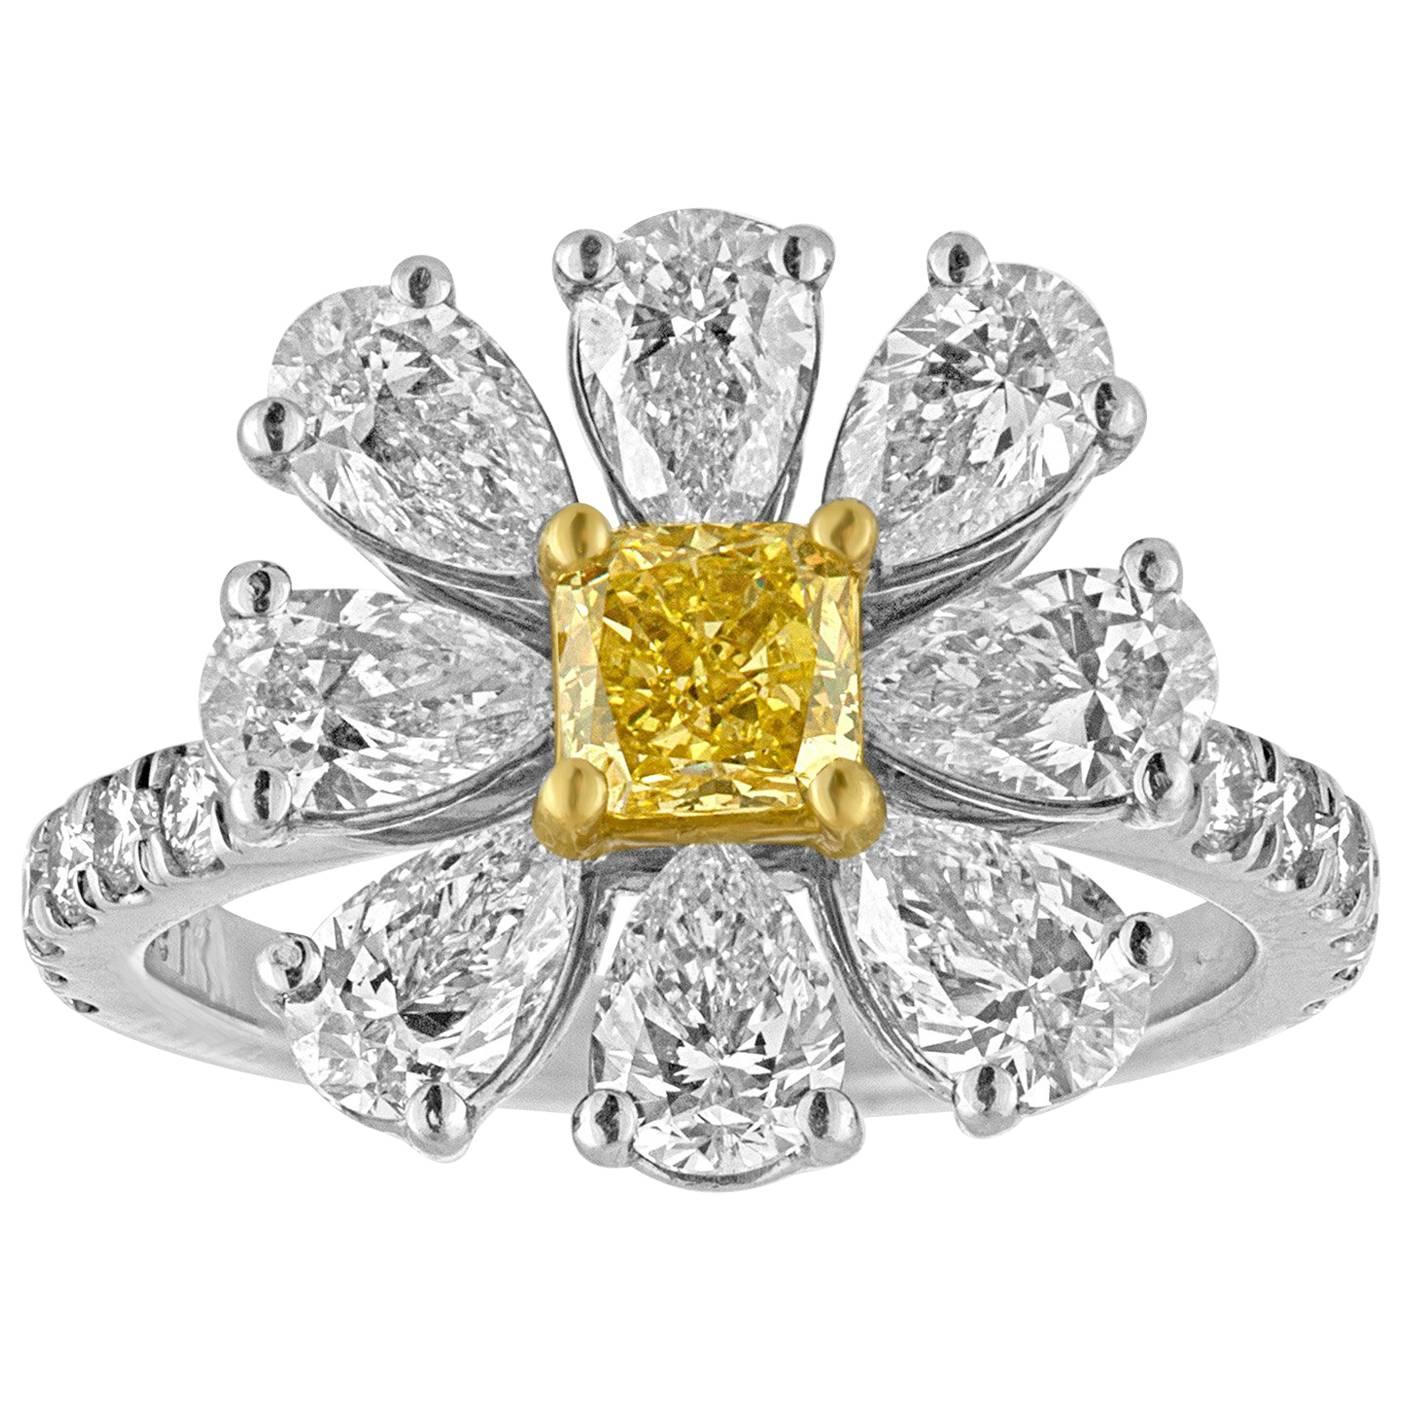 3.11 Carat Fancy Intense Yellow and White Diamonds Platinum Daisy Flower Ring